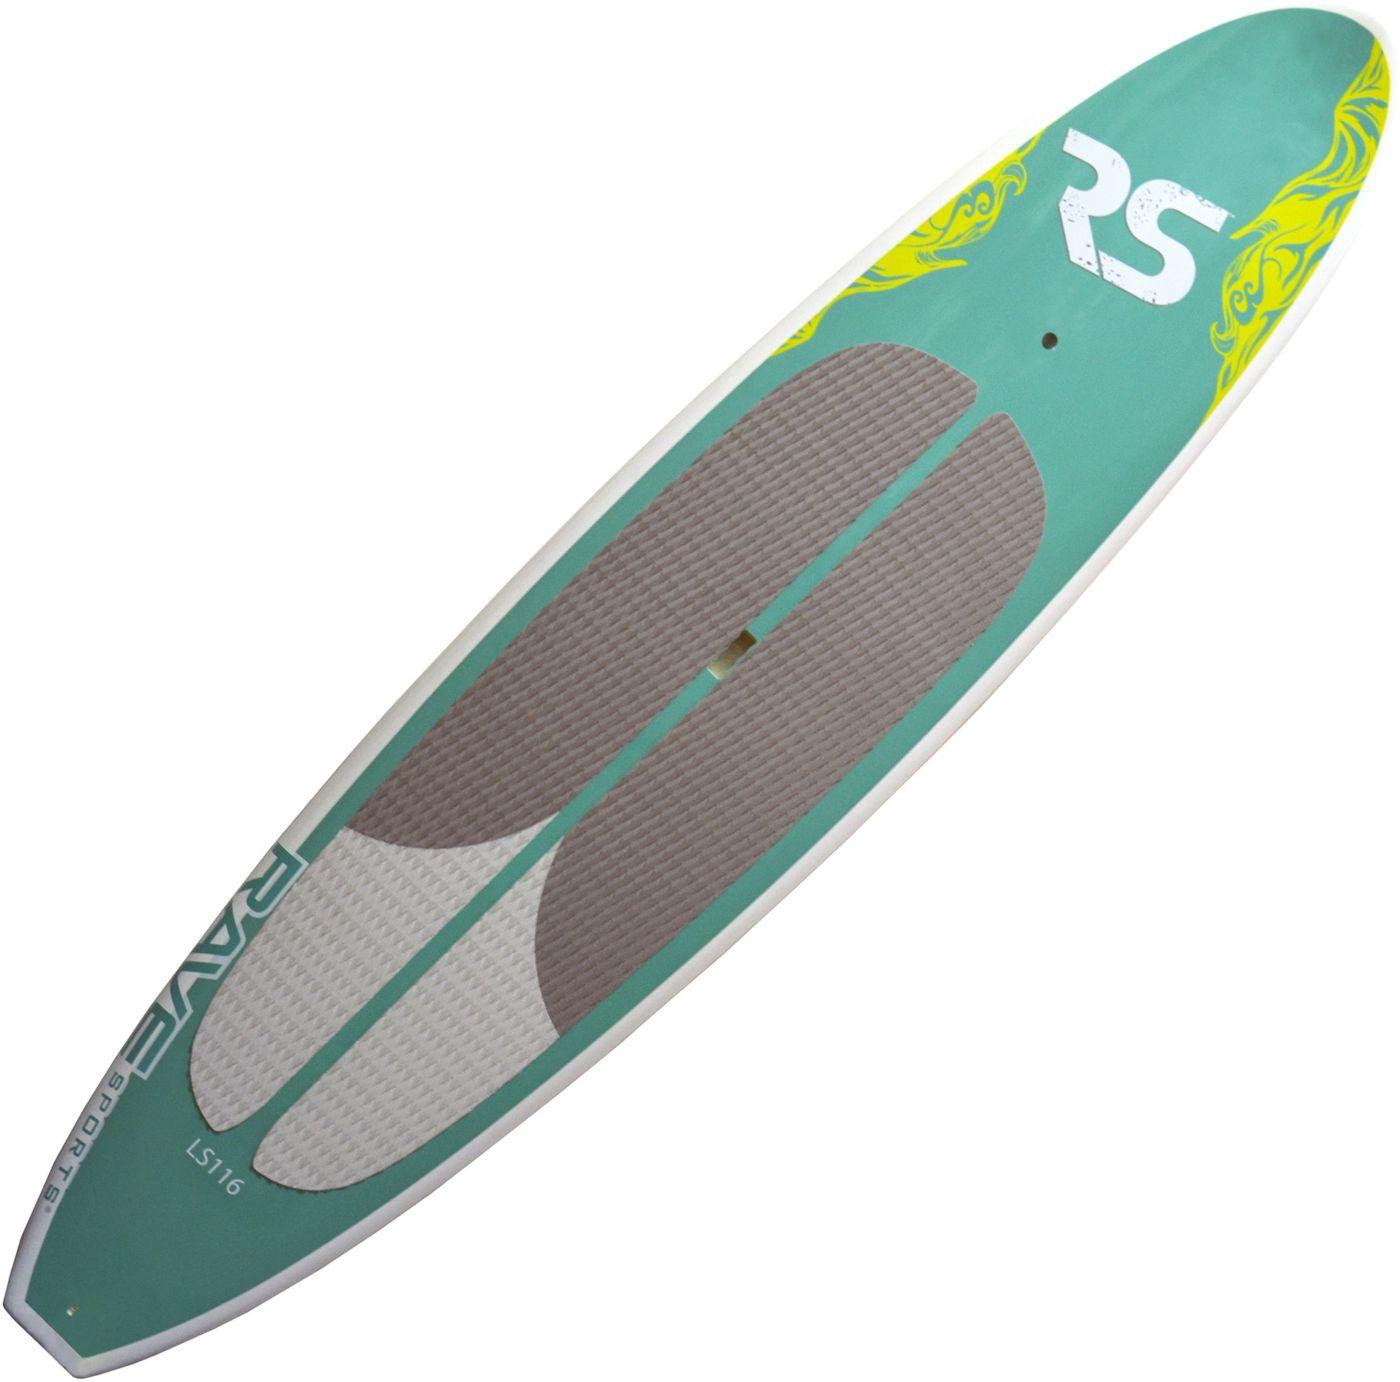 Rave Sports Lake Cruiser 116 Stand-Up Paddle Board